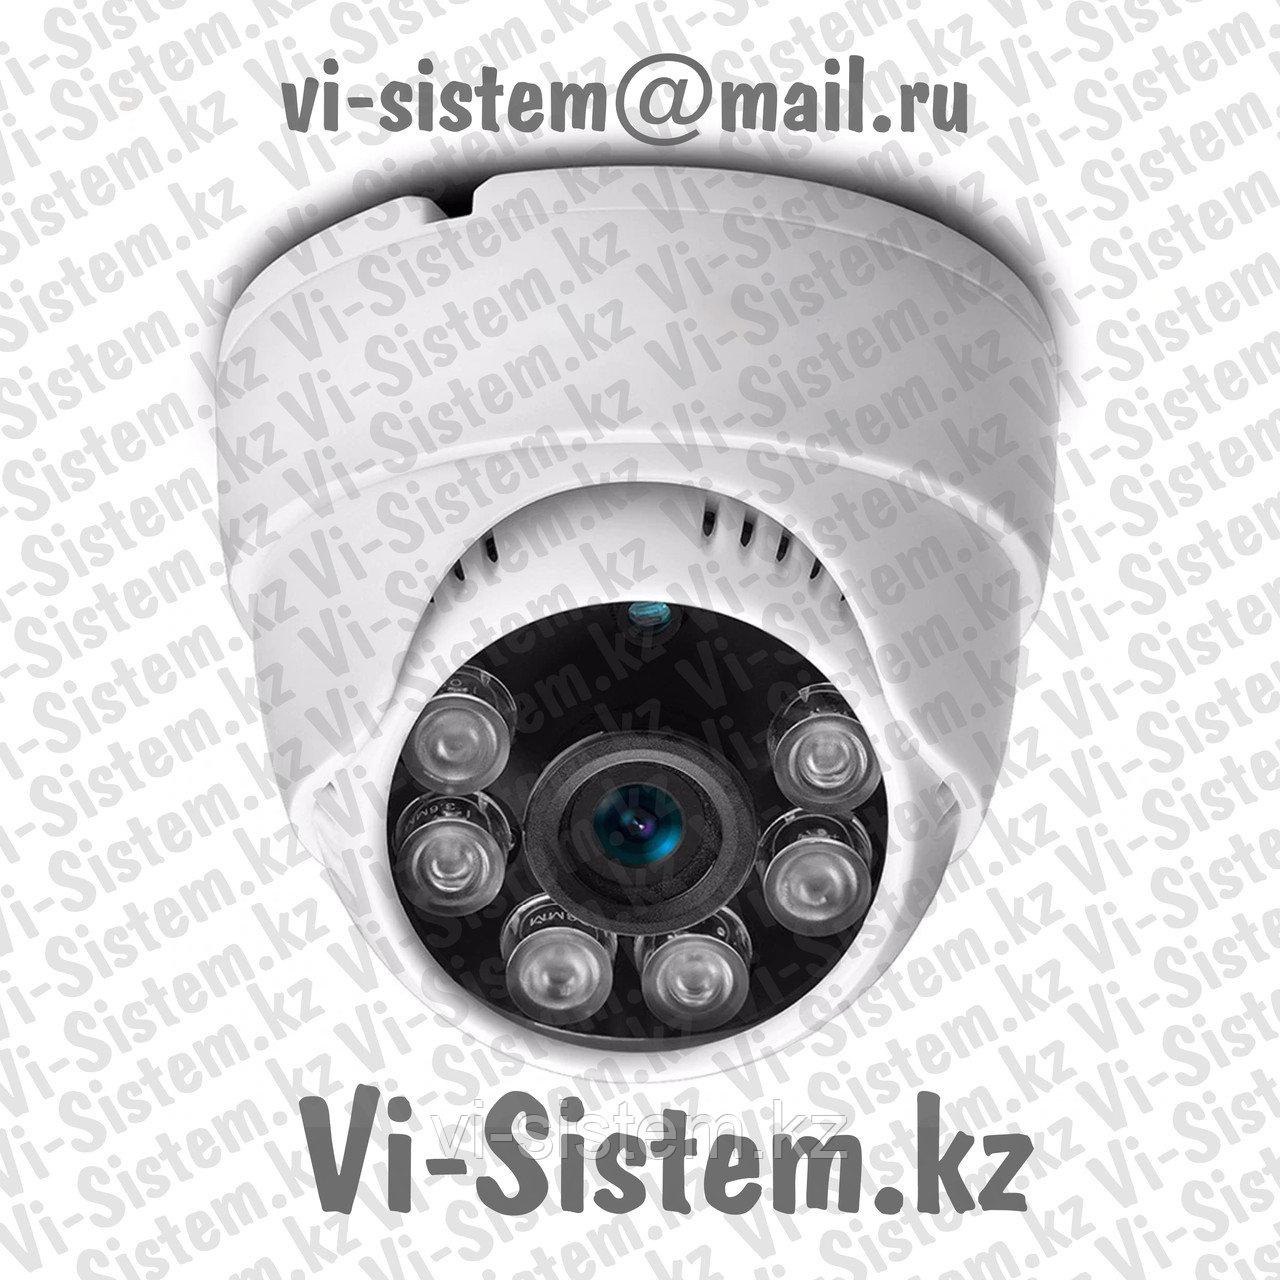 IP-Видеокамера SYNCAR IP-511 5MP